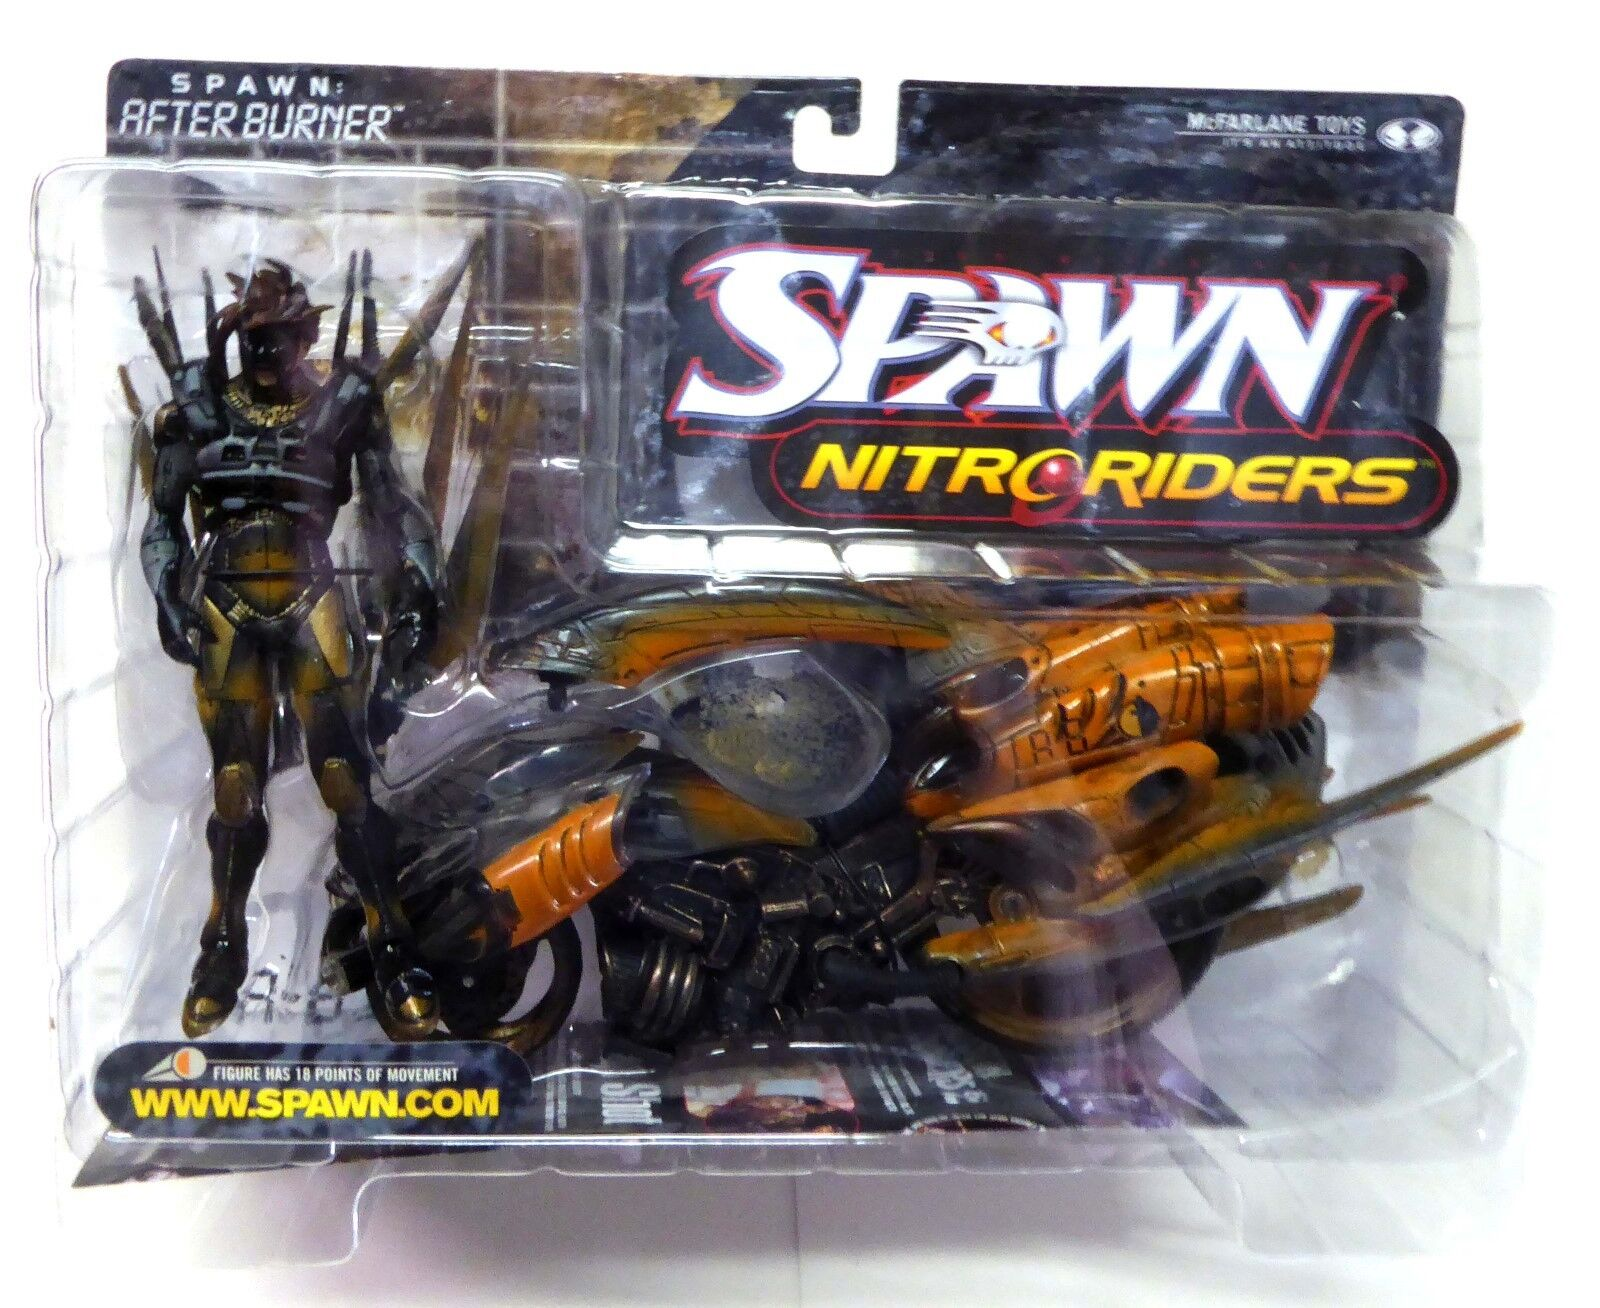 Nitro Riders Afterburner Action Figure McFarlane Toys Spawn Series 16 Nuovo 1999